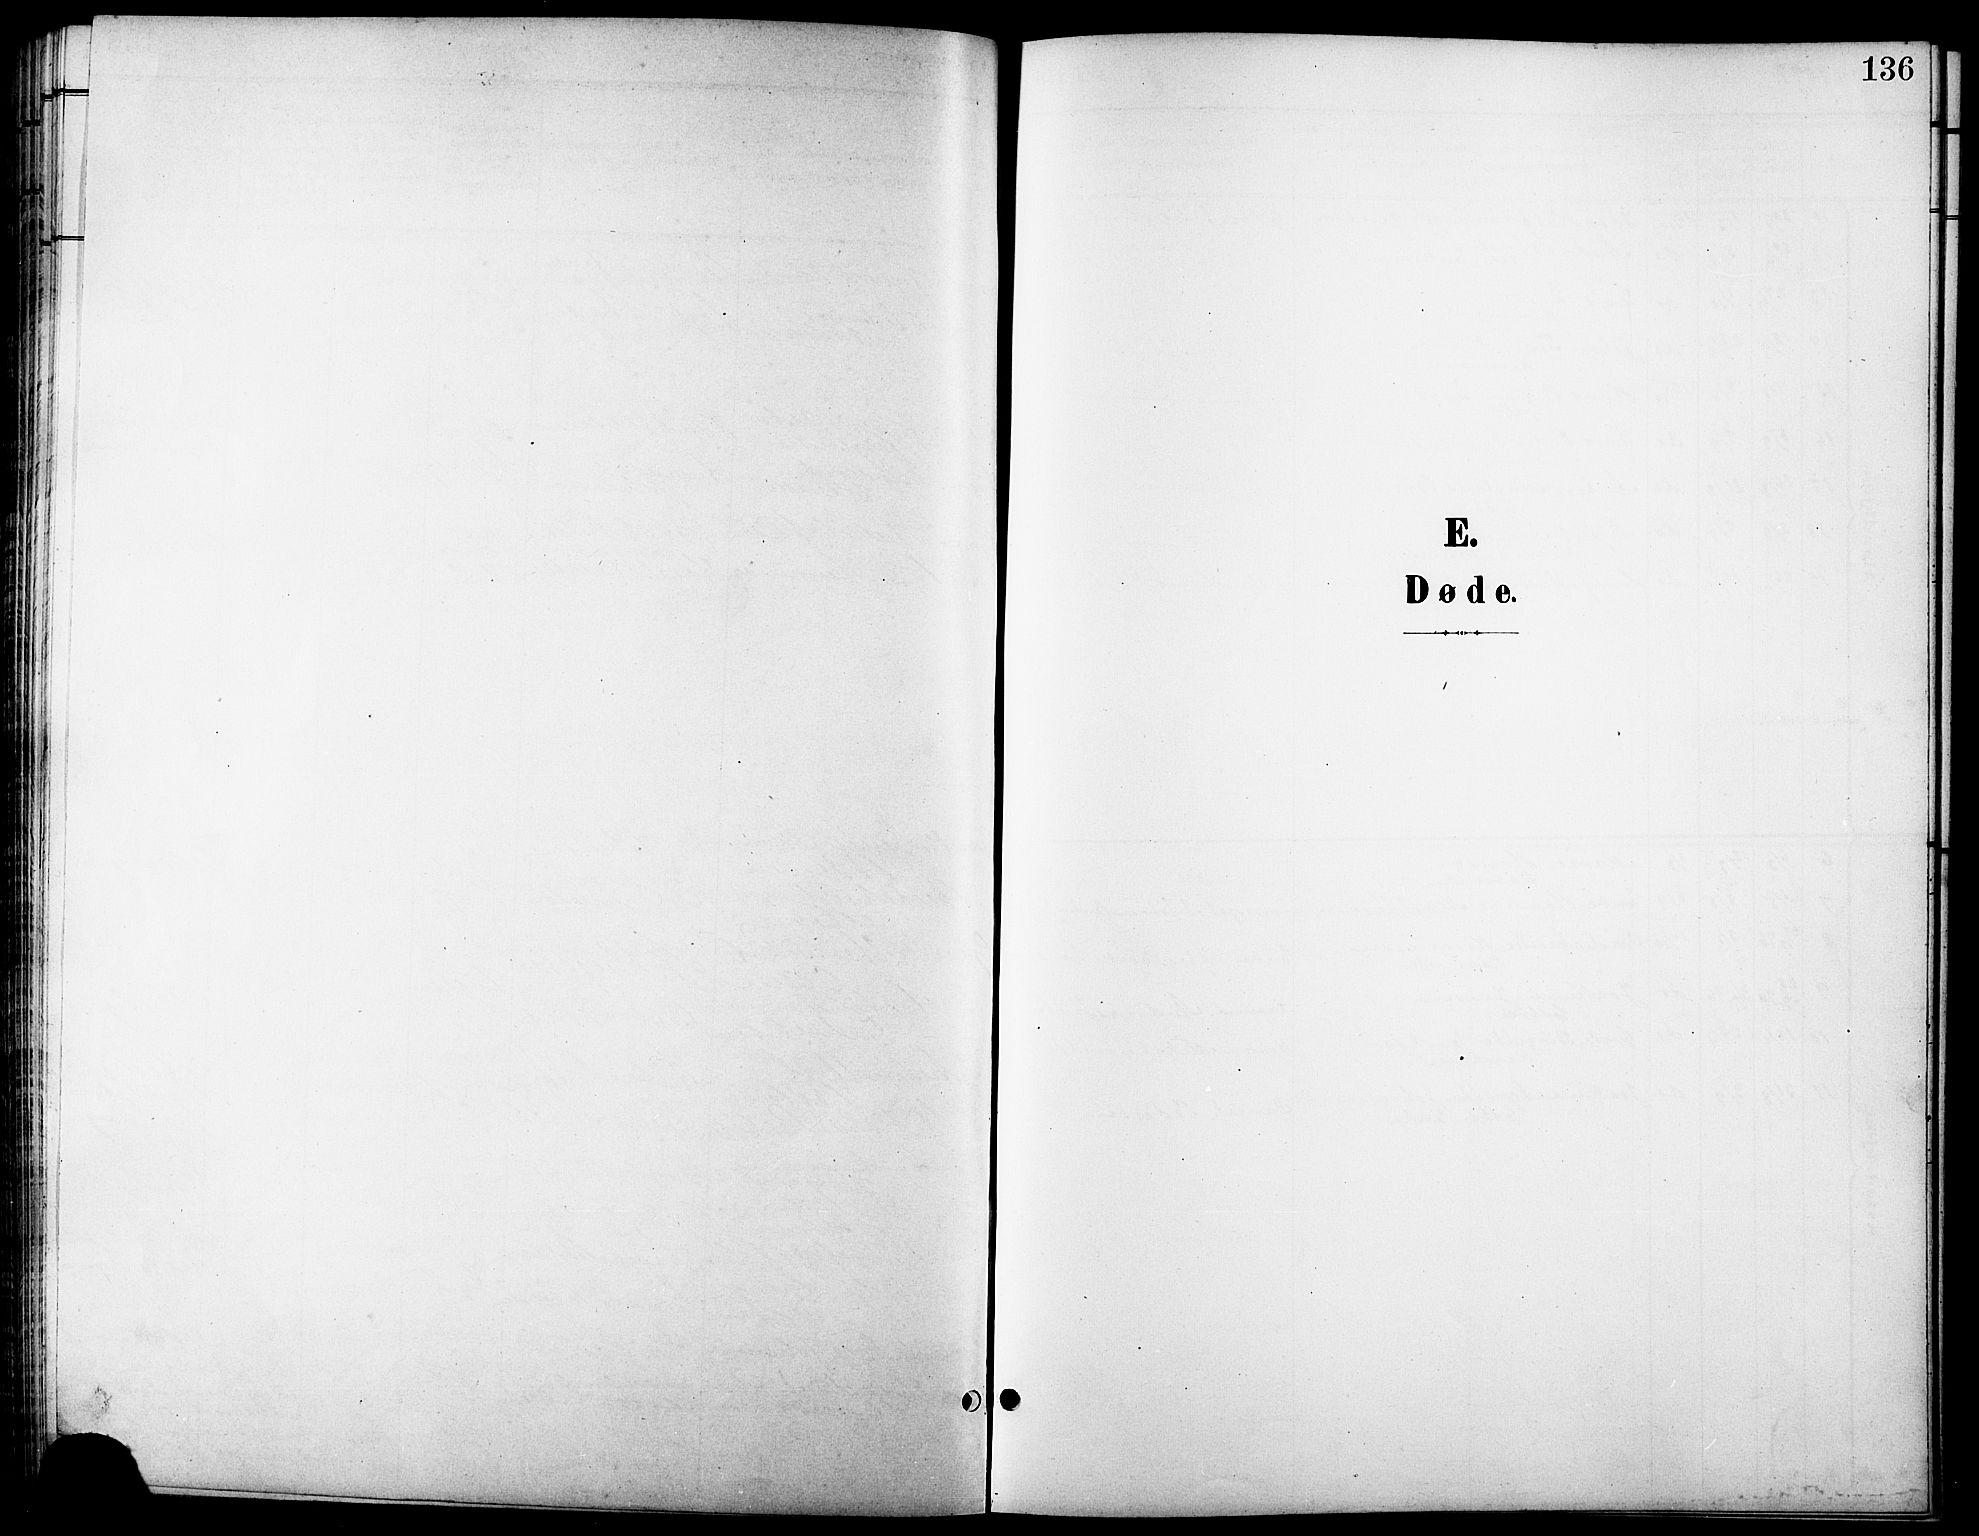 SATØ, Tranøy sokneprestkontor, I/Ia/Iab/L0014klokker: Klokkerbok nr. 14, 1896-1918, s. 136